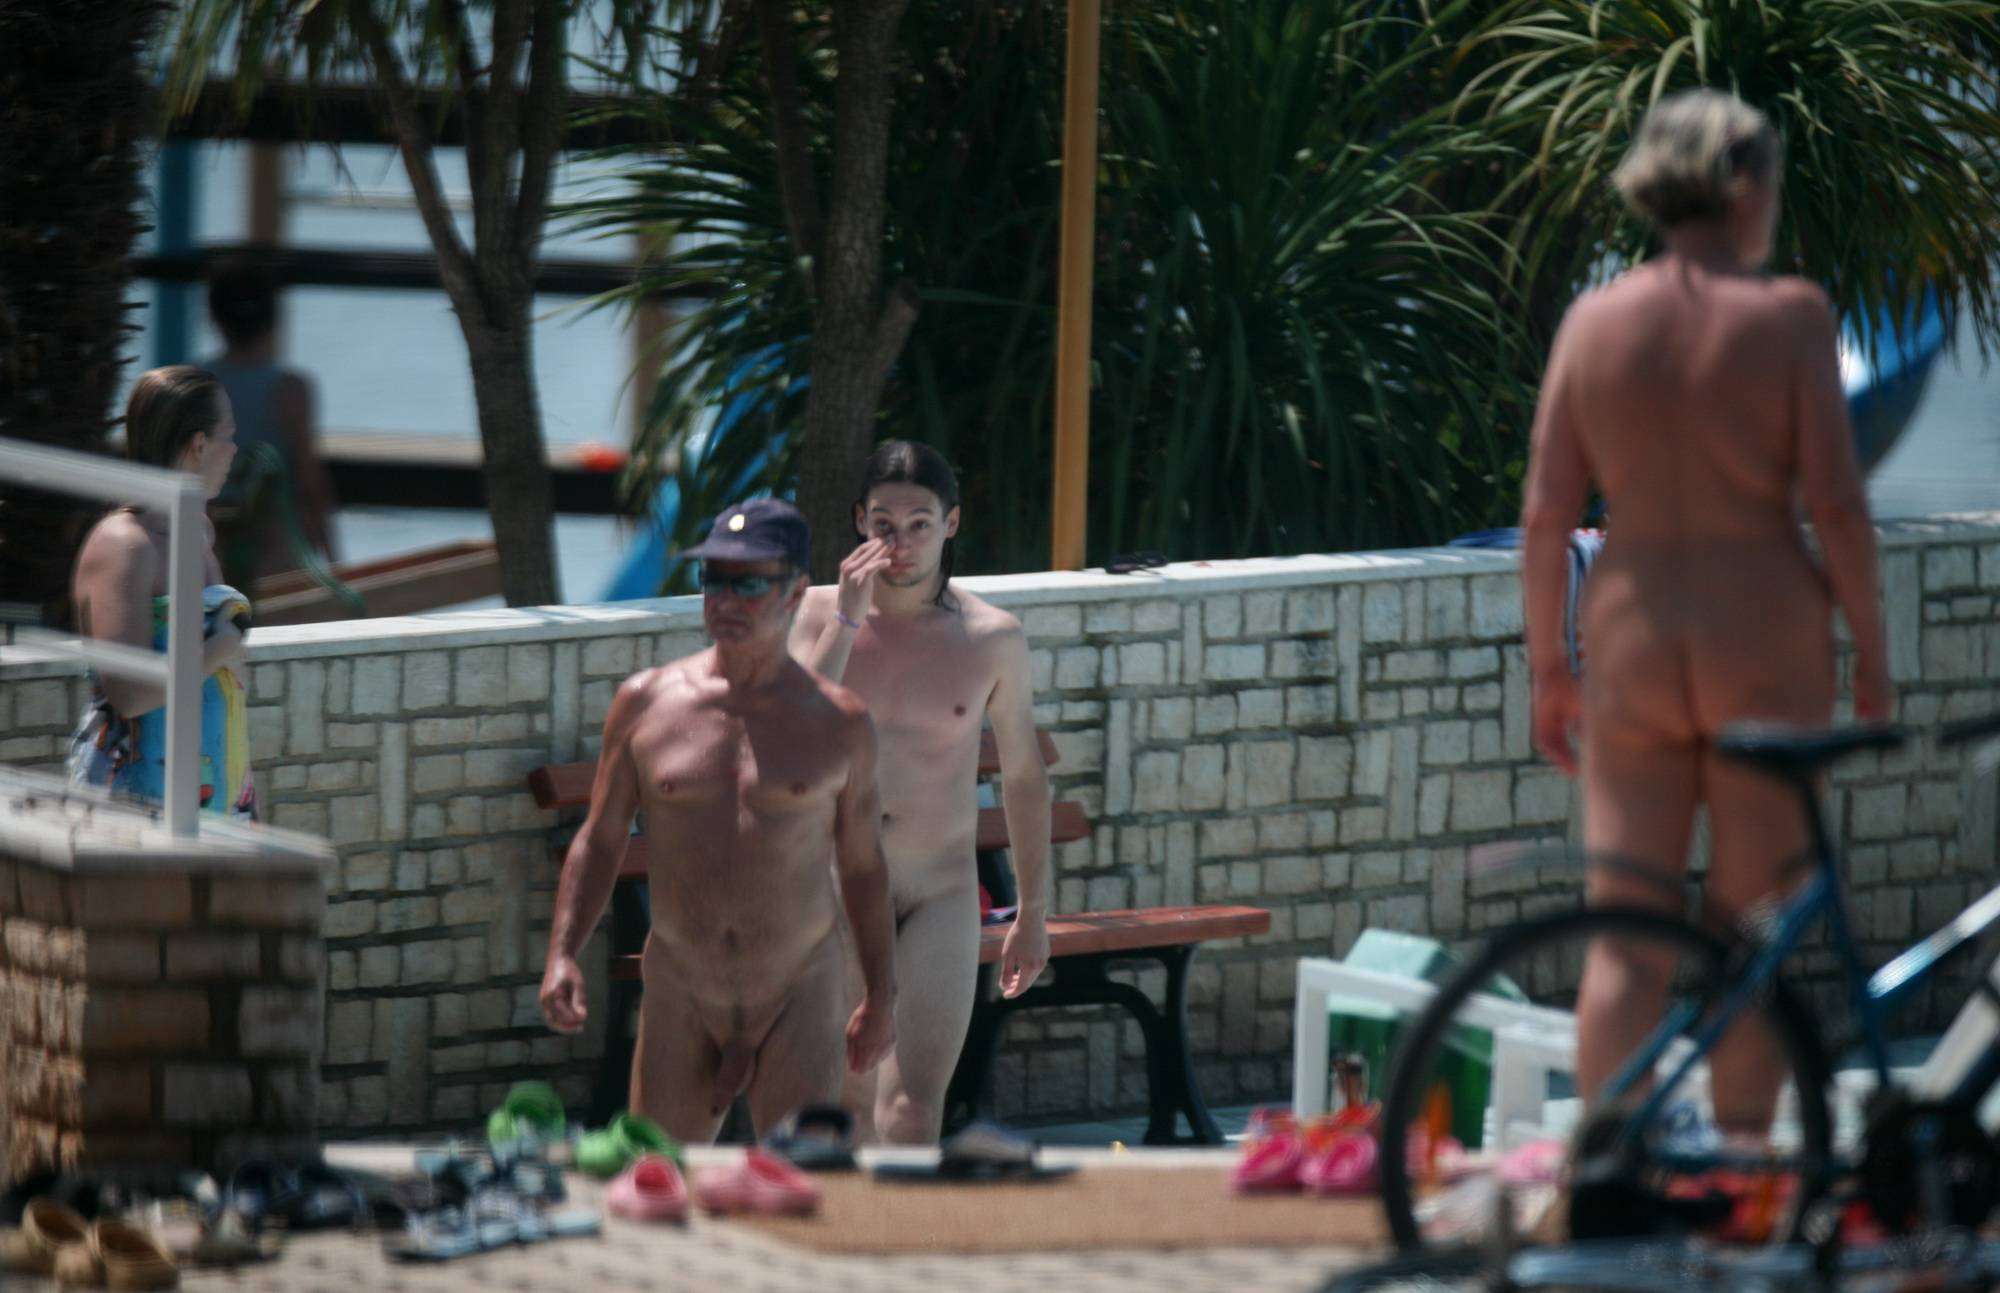 Nudist Photos European Exit Passages - 1